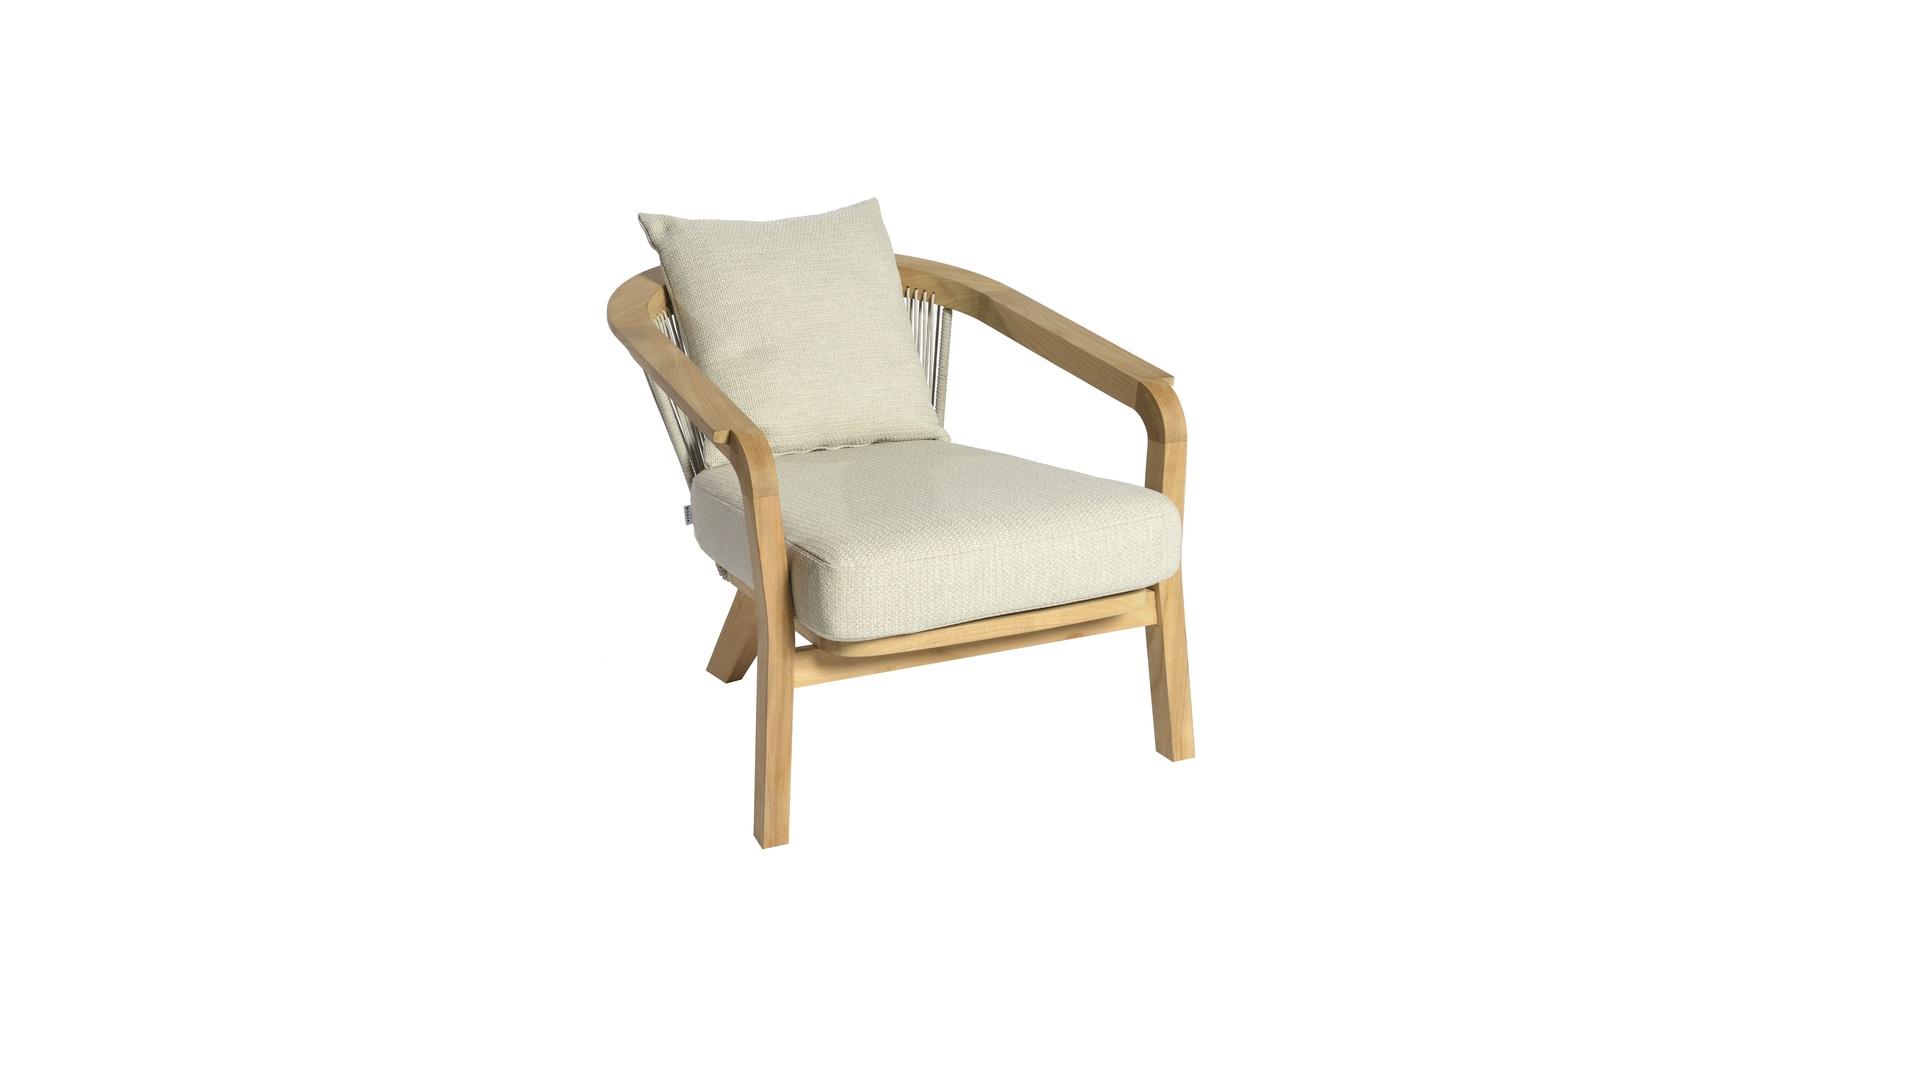 2020 Borek teak Chepri lounge chair 5682 2.jpg